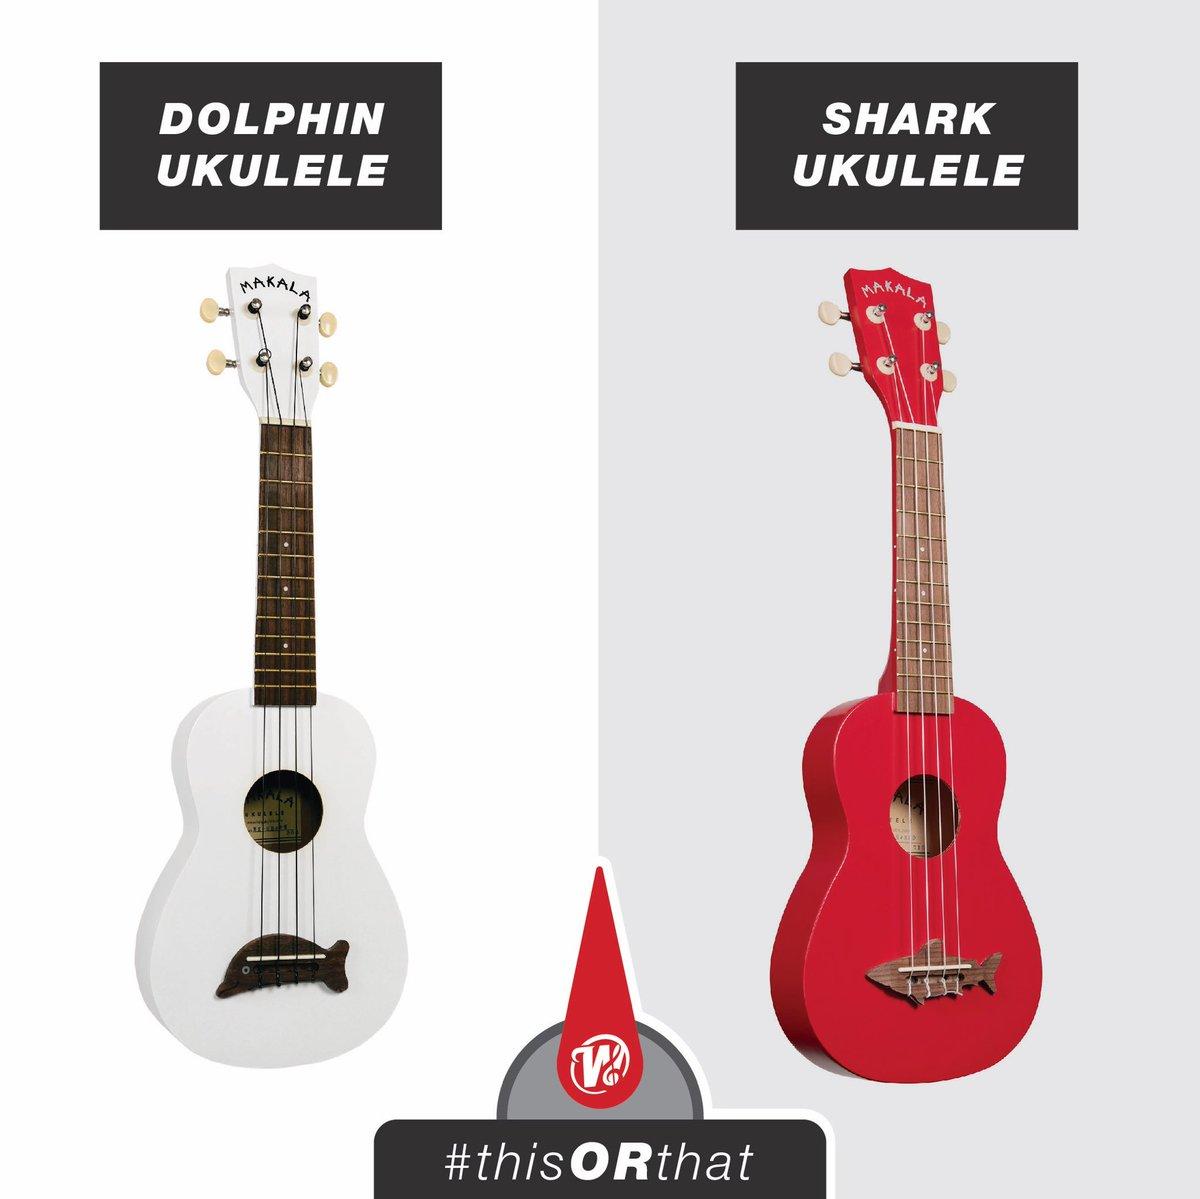 Are you a #dolphin or #shark fan?        @kalabrandmusic #ukulele #ukulelefan #ukecandoit #ukedchat #uketeacher #ukuleleteacher <br>http://pic.twitter.com/Z9MGCVF2l1